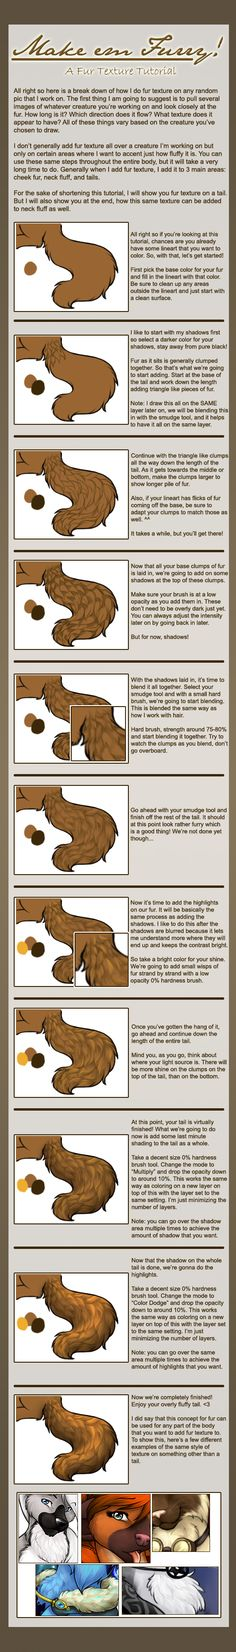 Make 'em Furry!: A fur texture tutorial By Clemikou on furaffinity.net http://www.furaffinity.net/view/8482767/